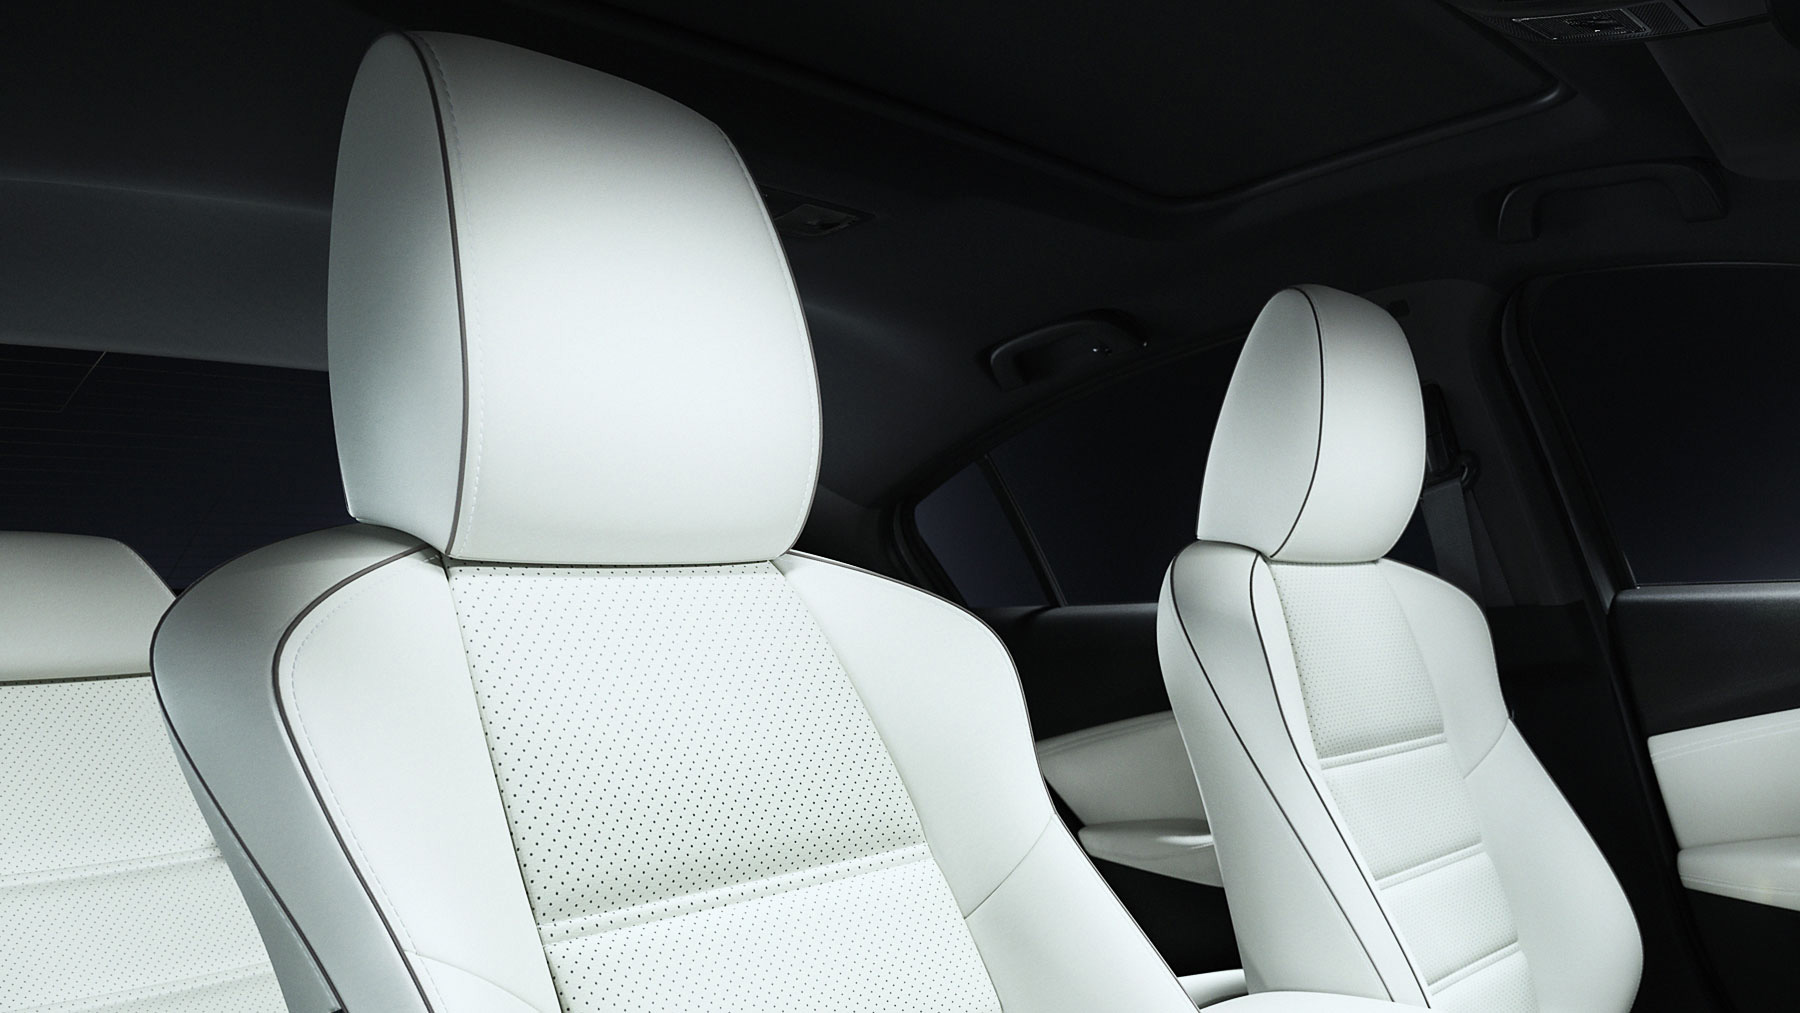 2017 mazda 6 sports sedan mid size cars mazda usa. Black Bedroom Furniture Sets. Home Design Ideas